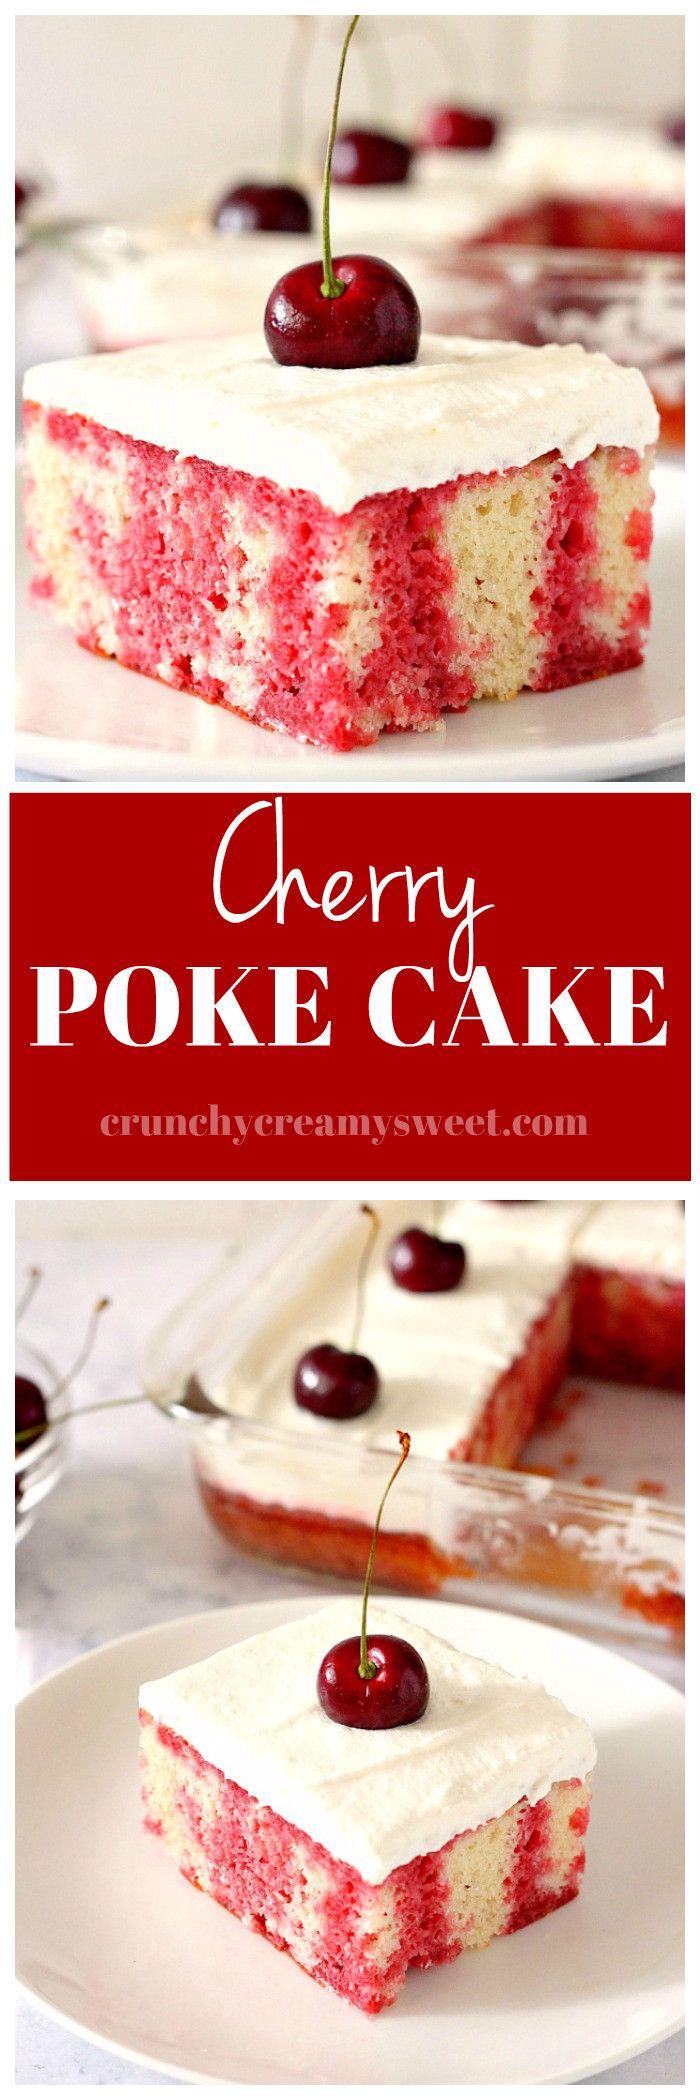 Cherry Poke Cake Recipe - fluffy vanilla cake with dark cherry jello, topped with whipped cream topping and fresh sweet cherries. www.crunchycreamysweet.com